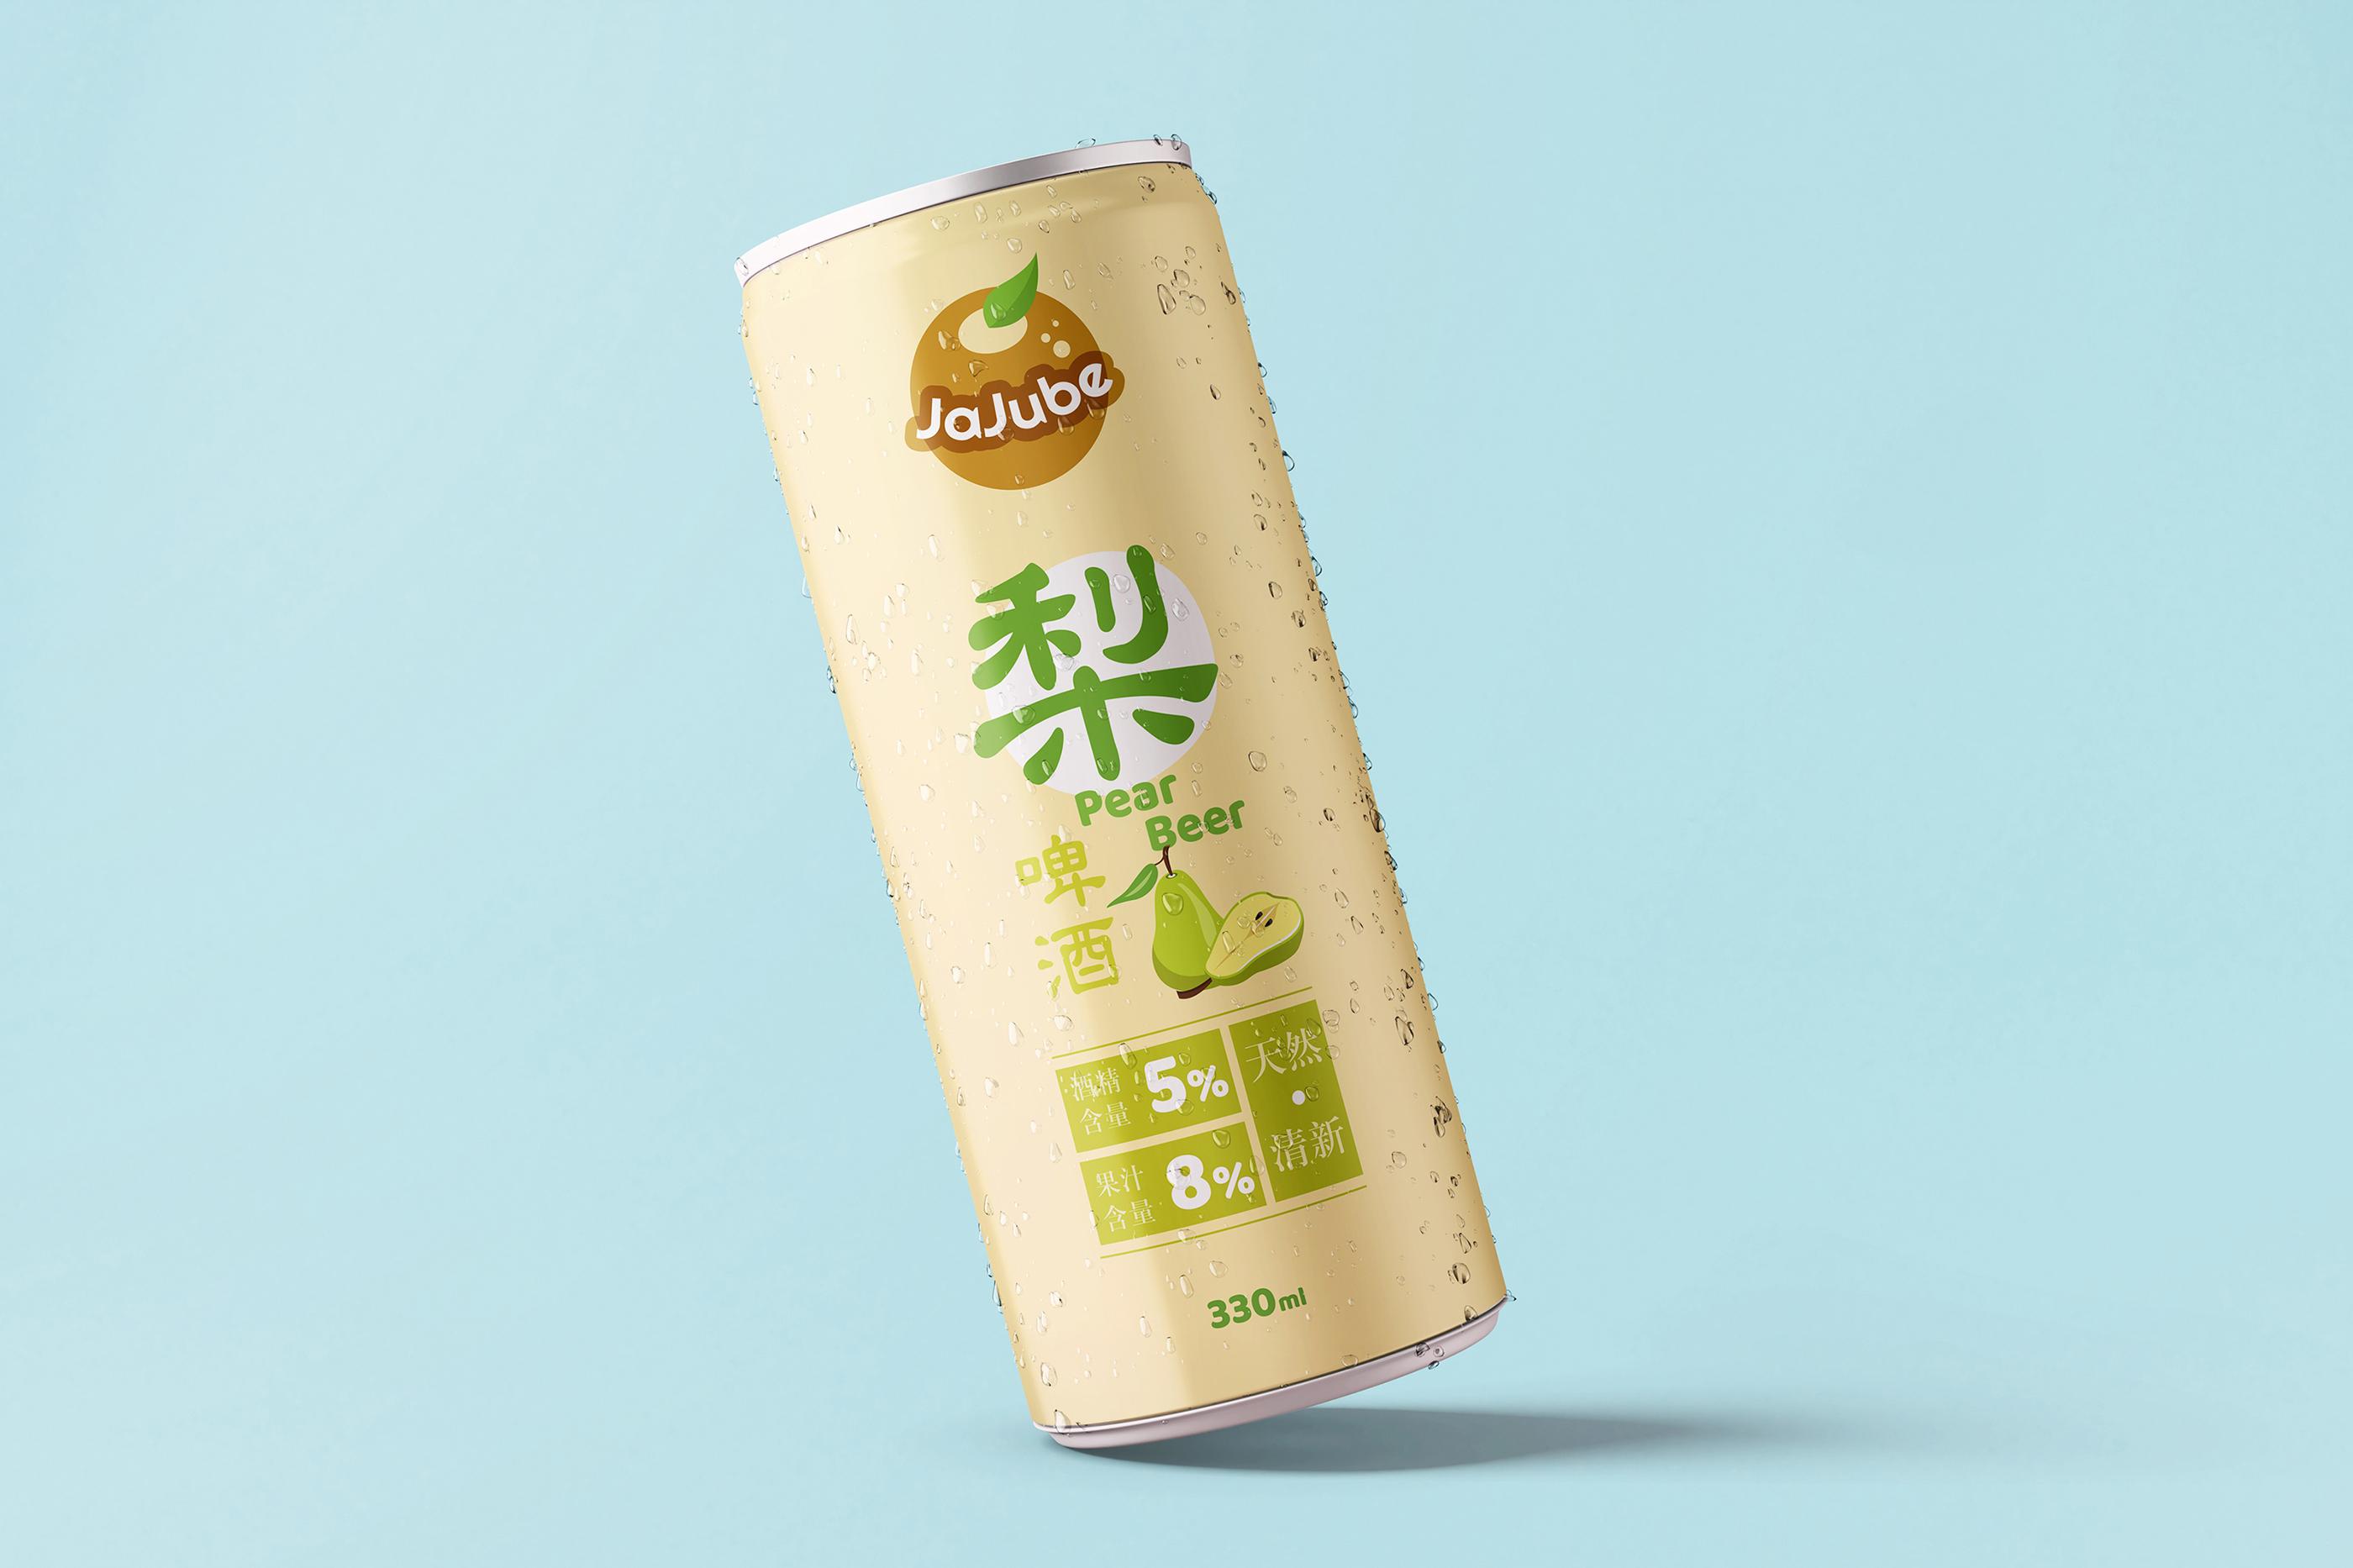 JaJube Fruit Beer